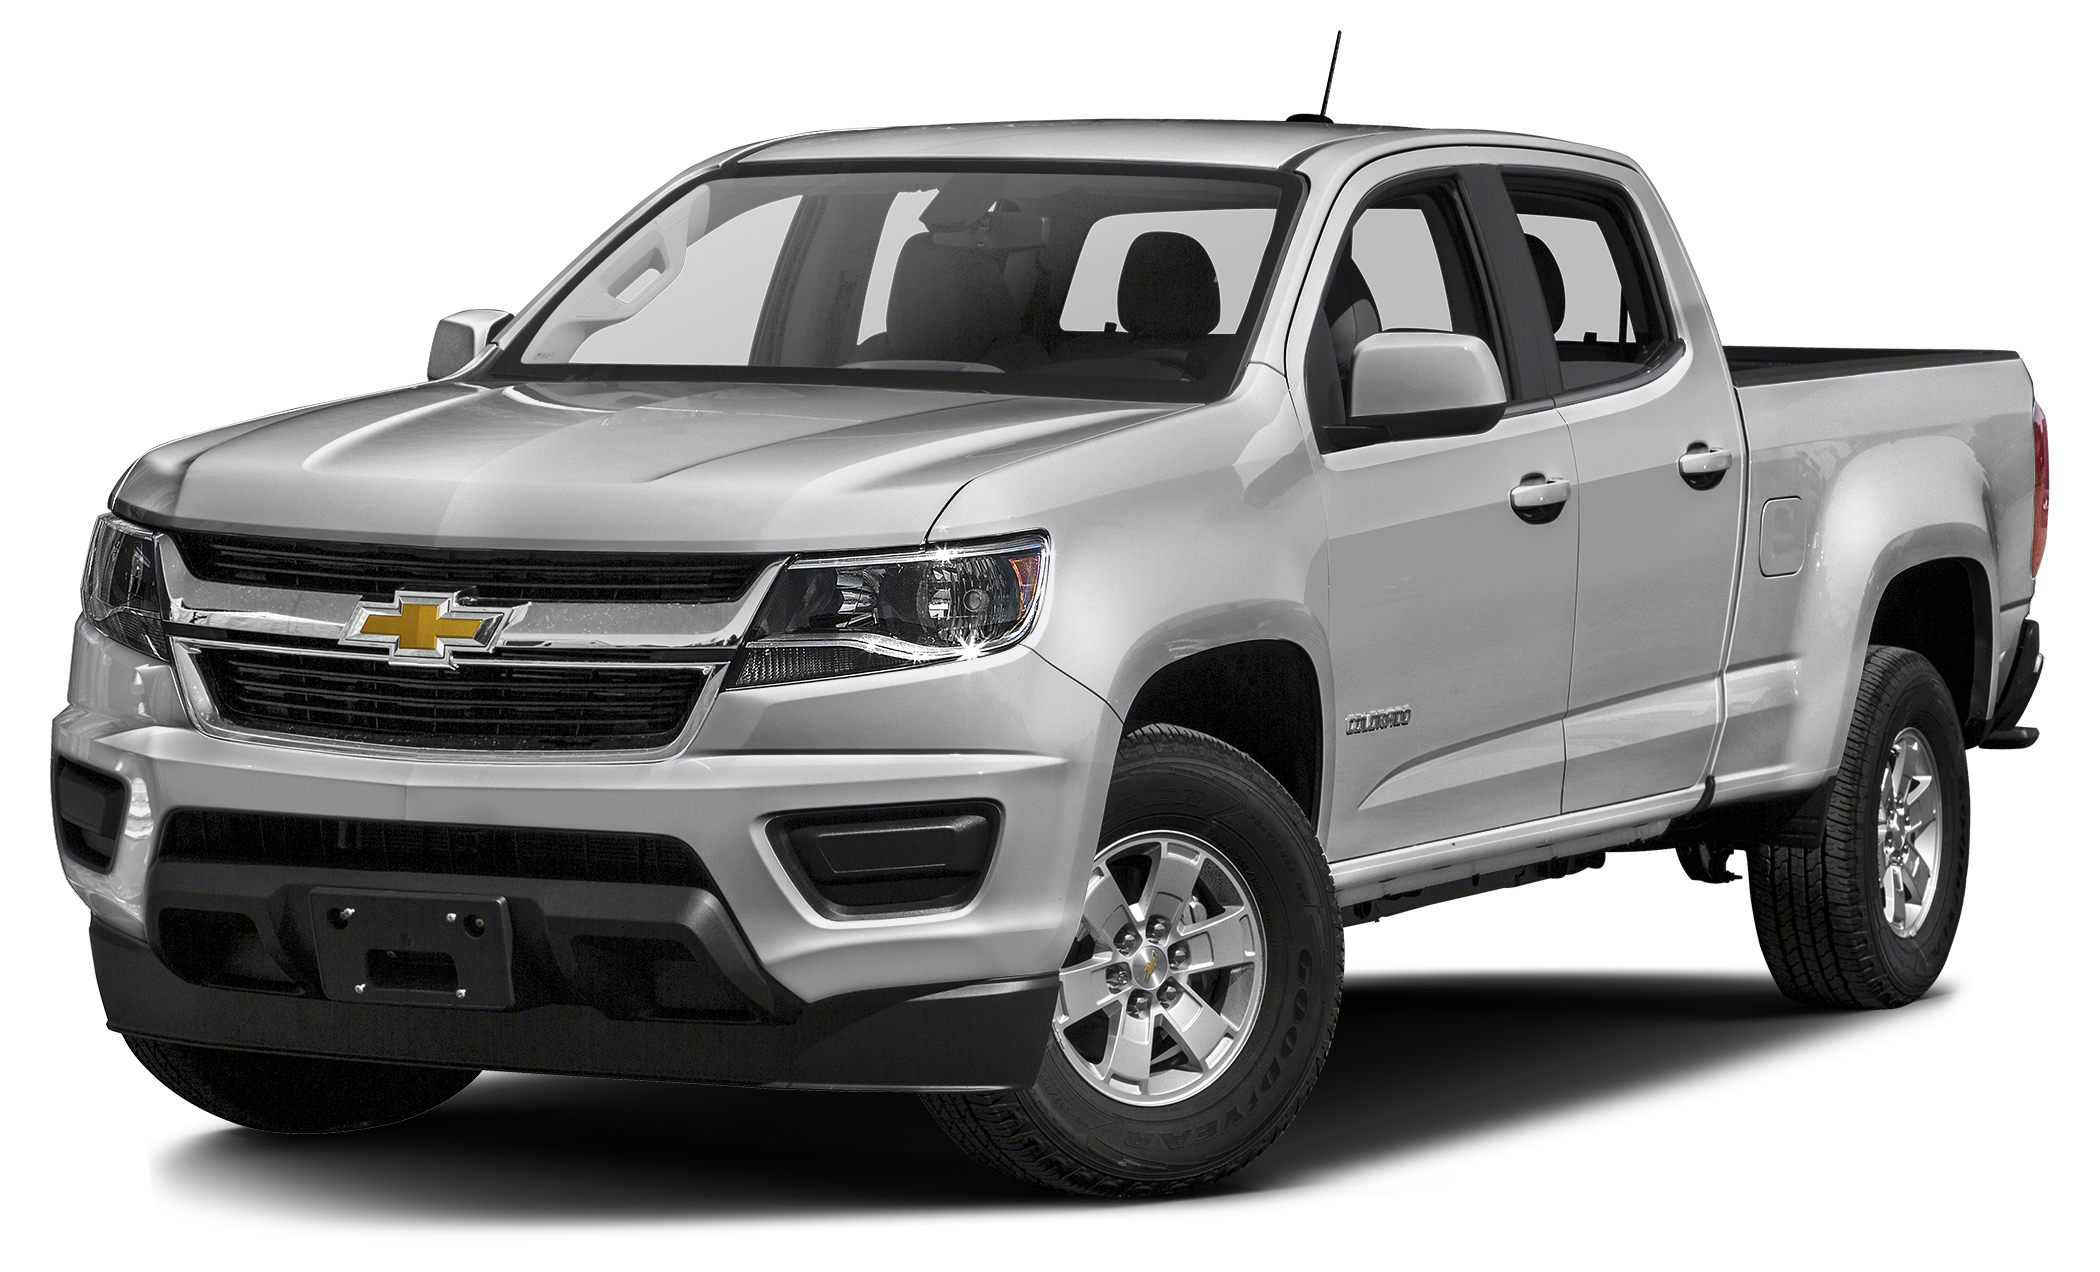 Prince Chevrolet Albany >> 2017 CHEVROLET COLORADO for sale in Albany, GA | 1GCGSBEN1H1262074